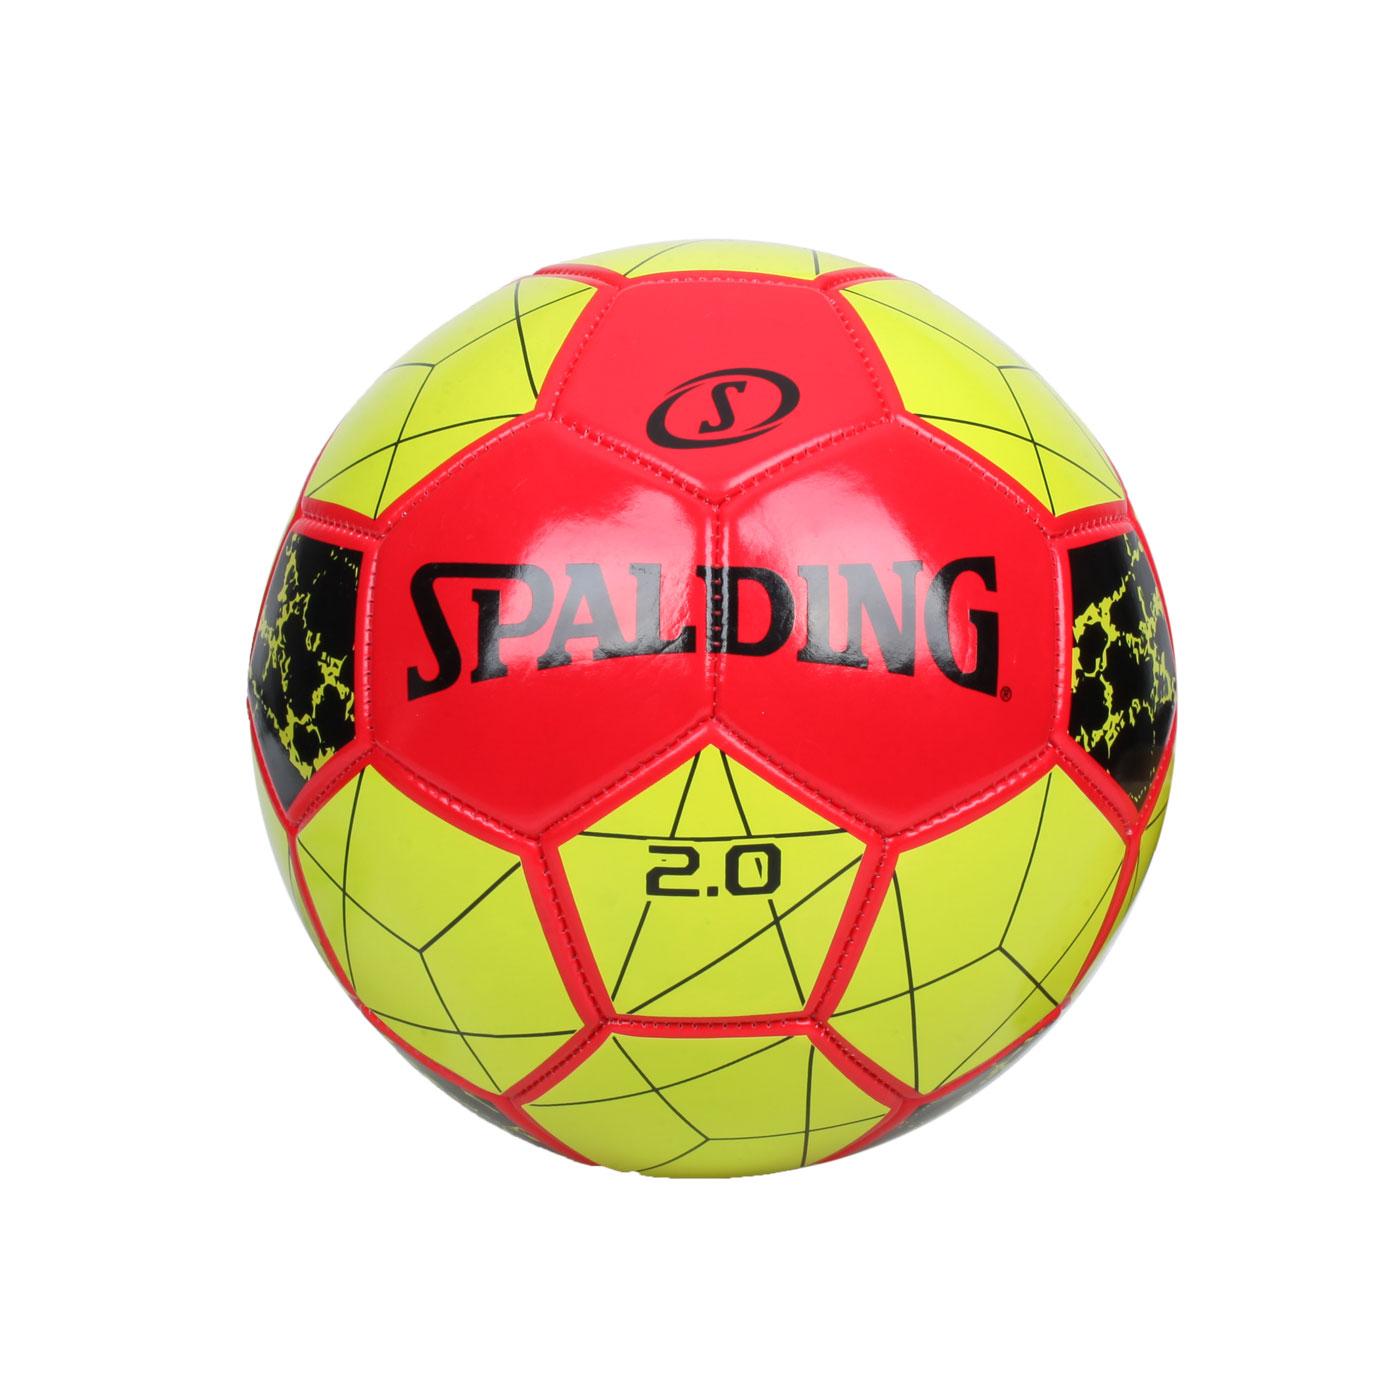 SPALDING 2.0#5號足球 SPA64950 - 綠紅